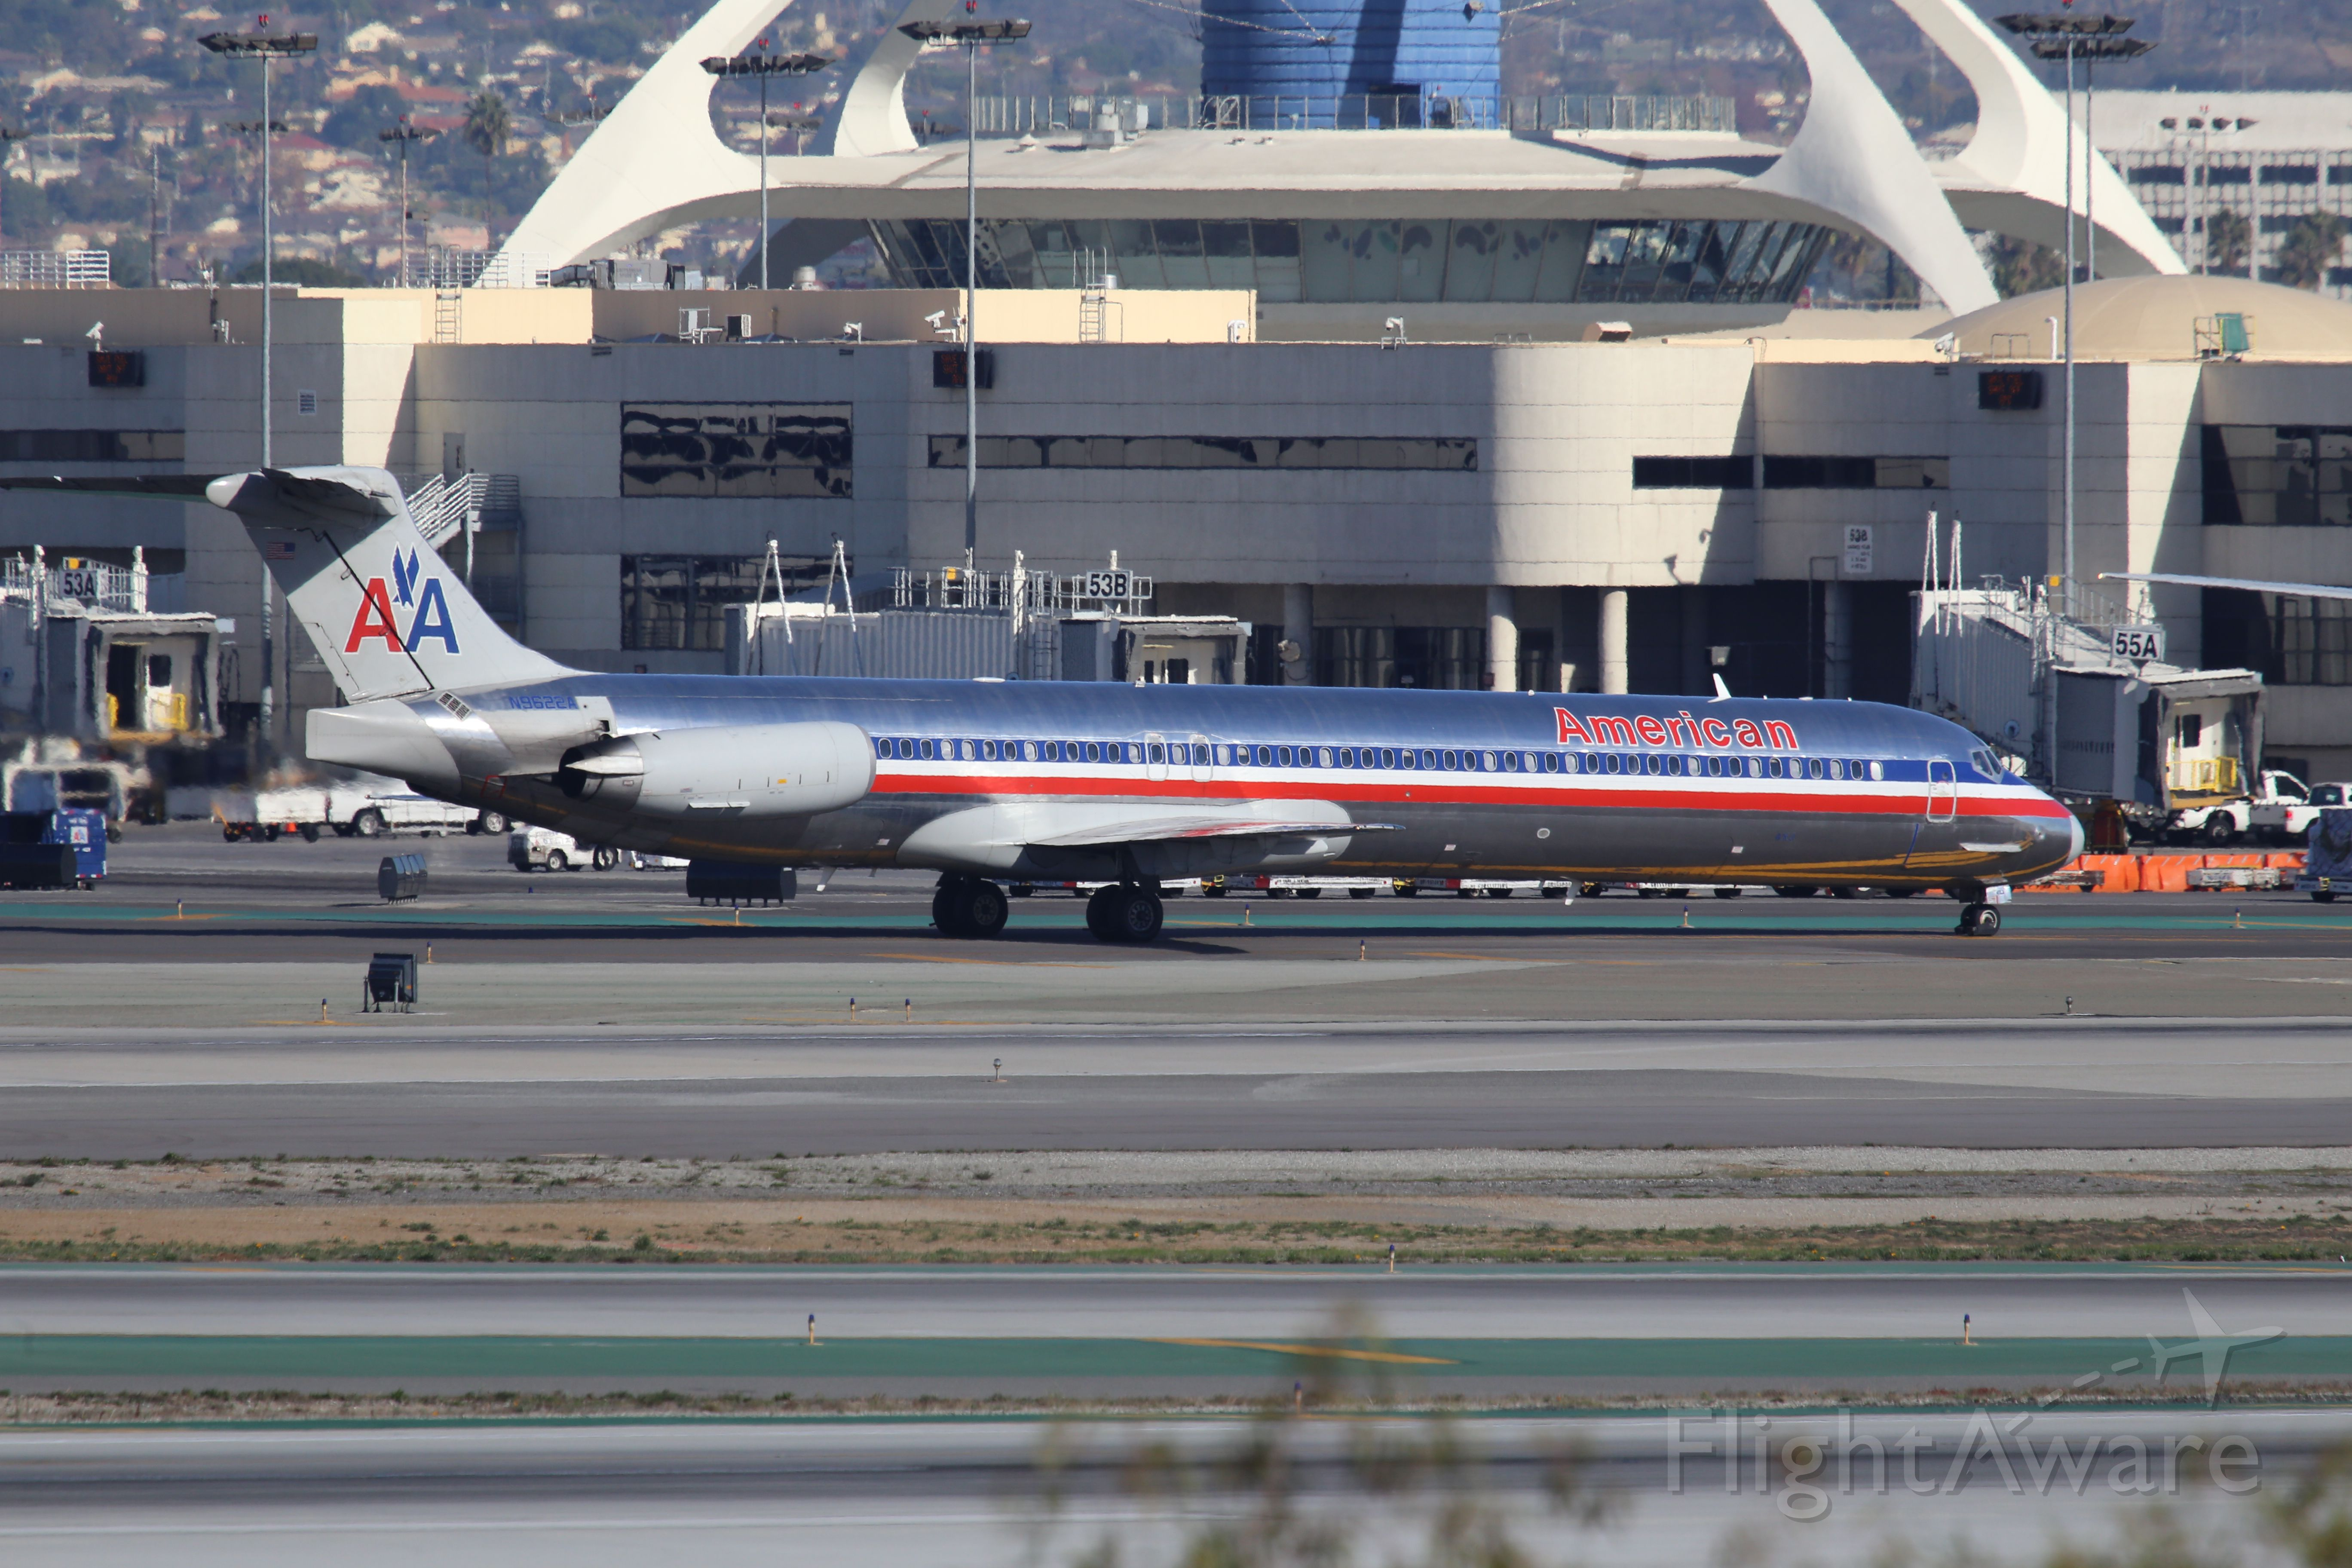 McDonnell Douglas MD-80 (N9622A)